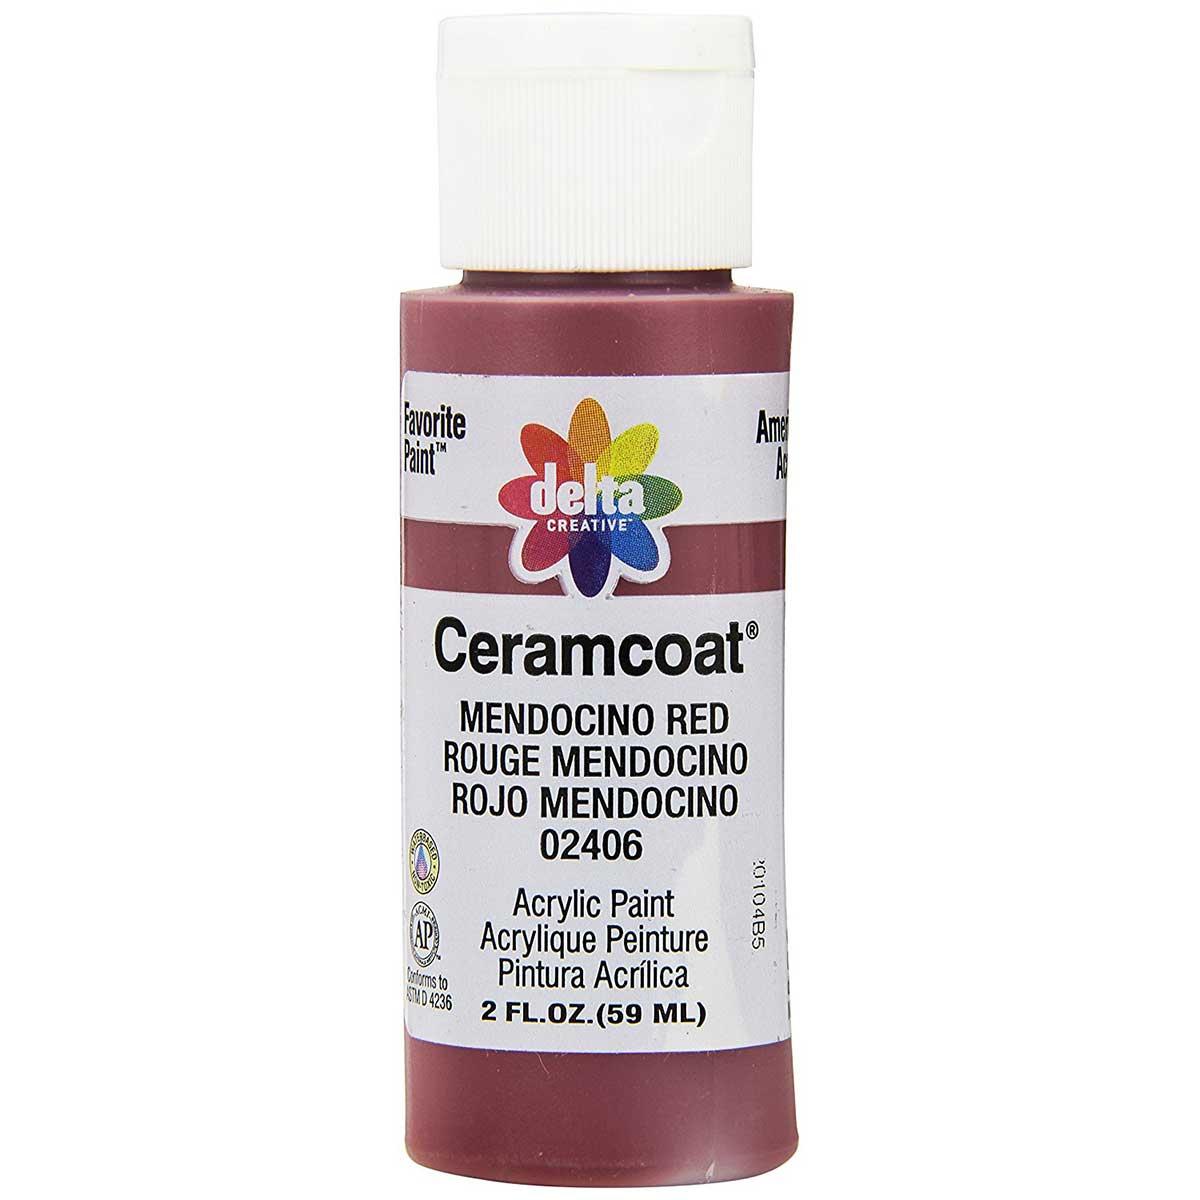 Delta Ceramcoat ® Acrylic Paint - Mendocino Red, 2 oz. - 024060202W